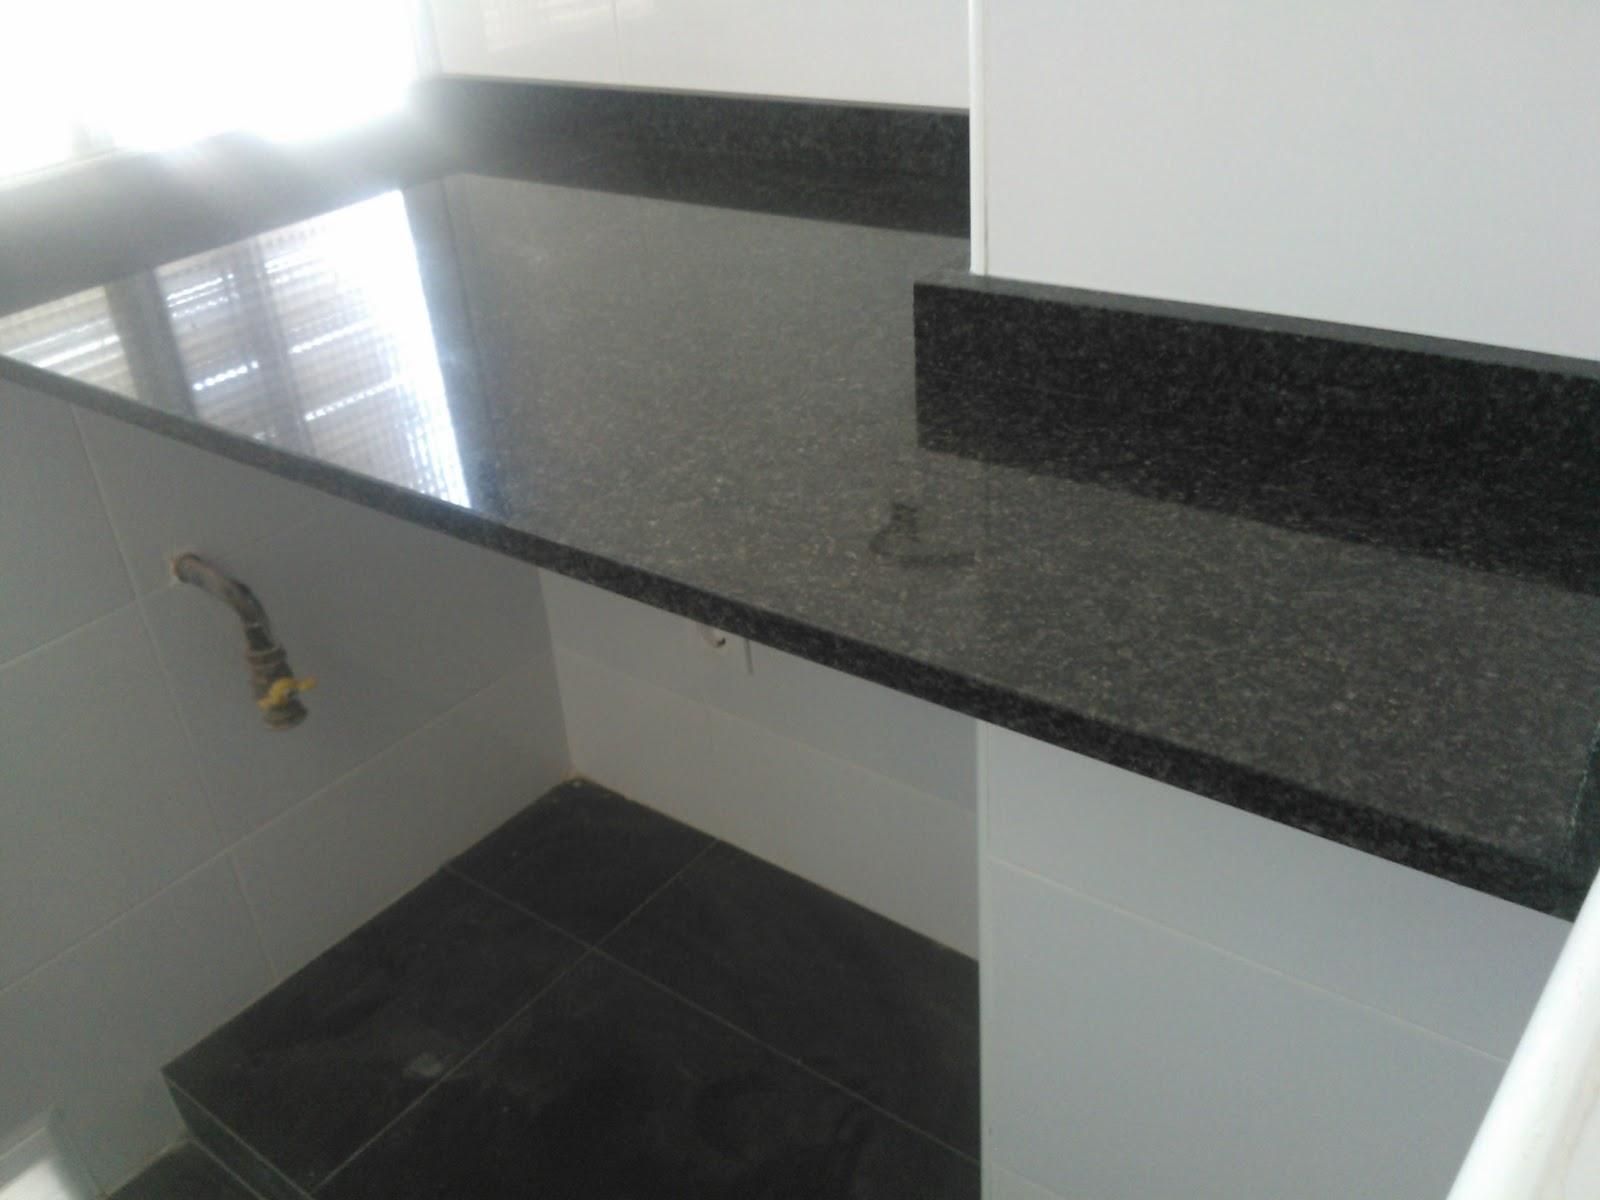 Marmoles vedat s l u montaje encimera granito negro for Colores de granito negro